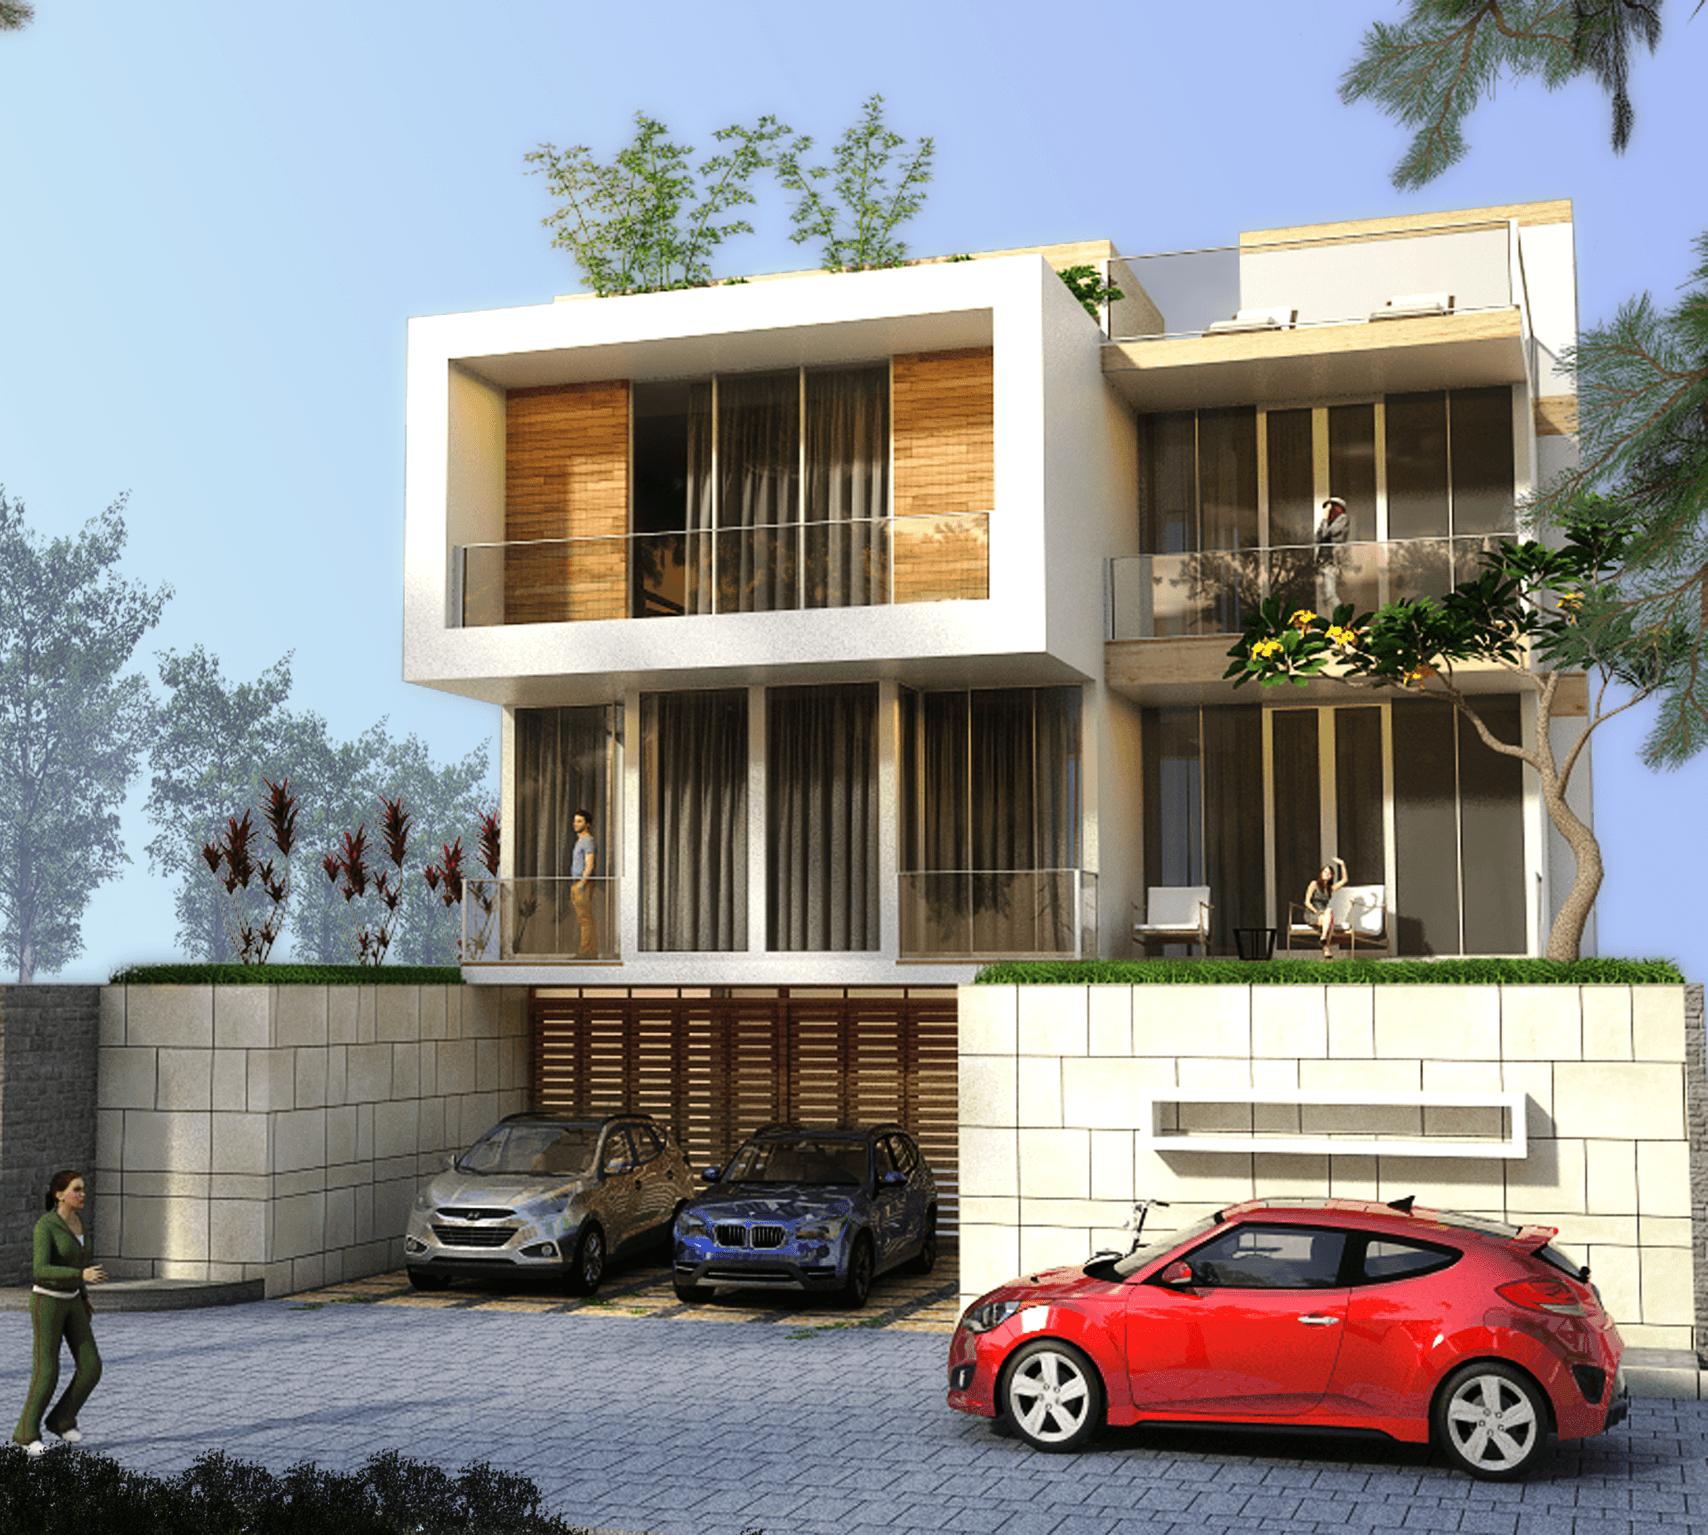 Sabio Design Box Modern House At Dago Resort, Bandung Kav. 96, Jl. Dago Pakar Permai I No.9, Mekarsaluyu, Kec. Cimenyan, Bandung, Jawa Barat 40198, Indonesia Kav. 96, Jl. Dago Pakar Permai I No.9, Mekarsaluyu, Kec. Cimenyan, Bandung, Jawa Barat 40198, Indonesia Sabio-Design-Box-Modern-House-At-Dago-Resort-Bandung  119881